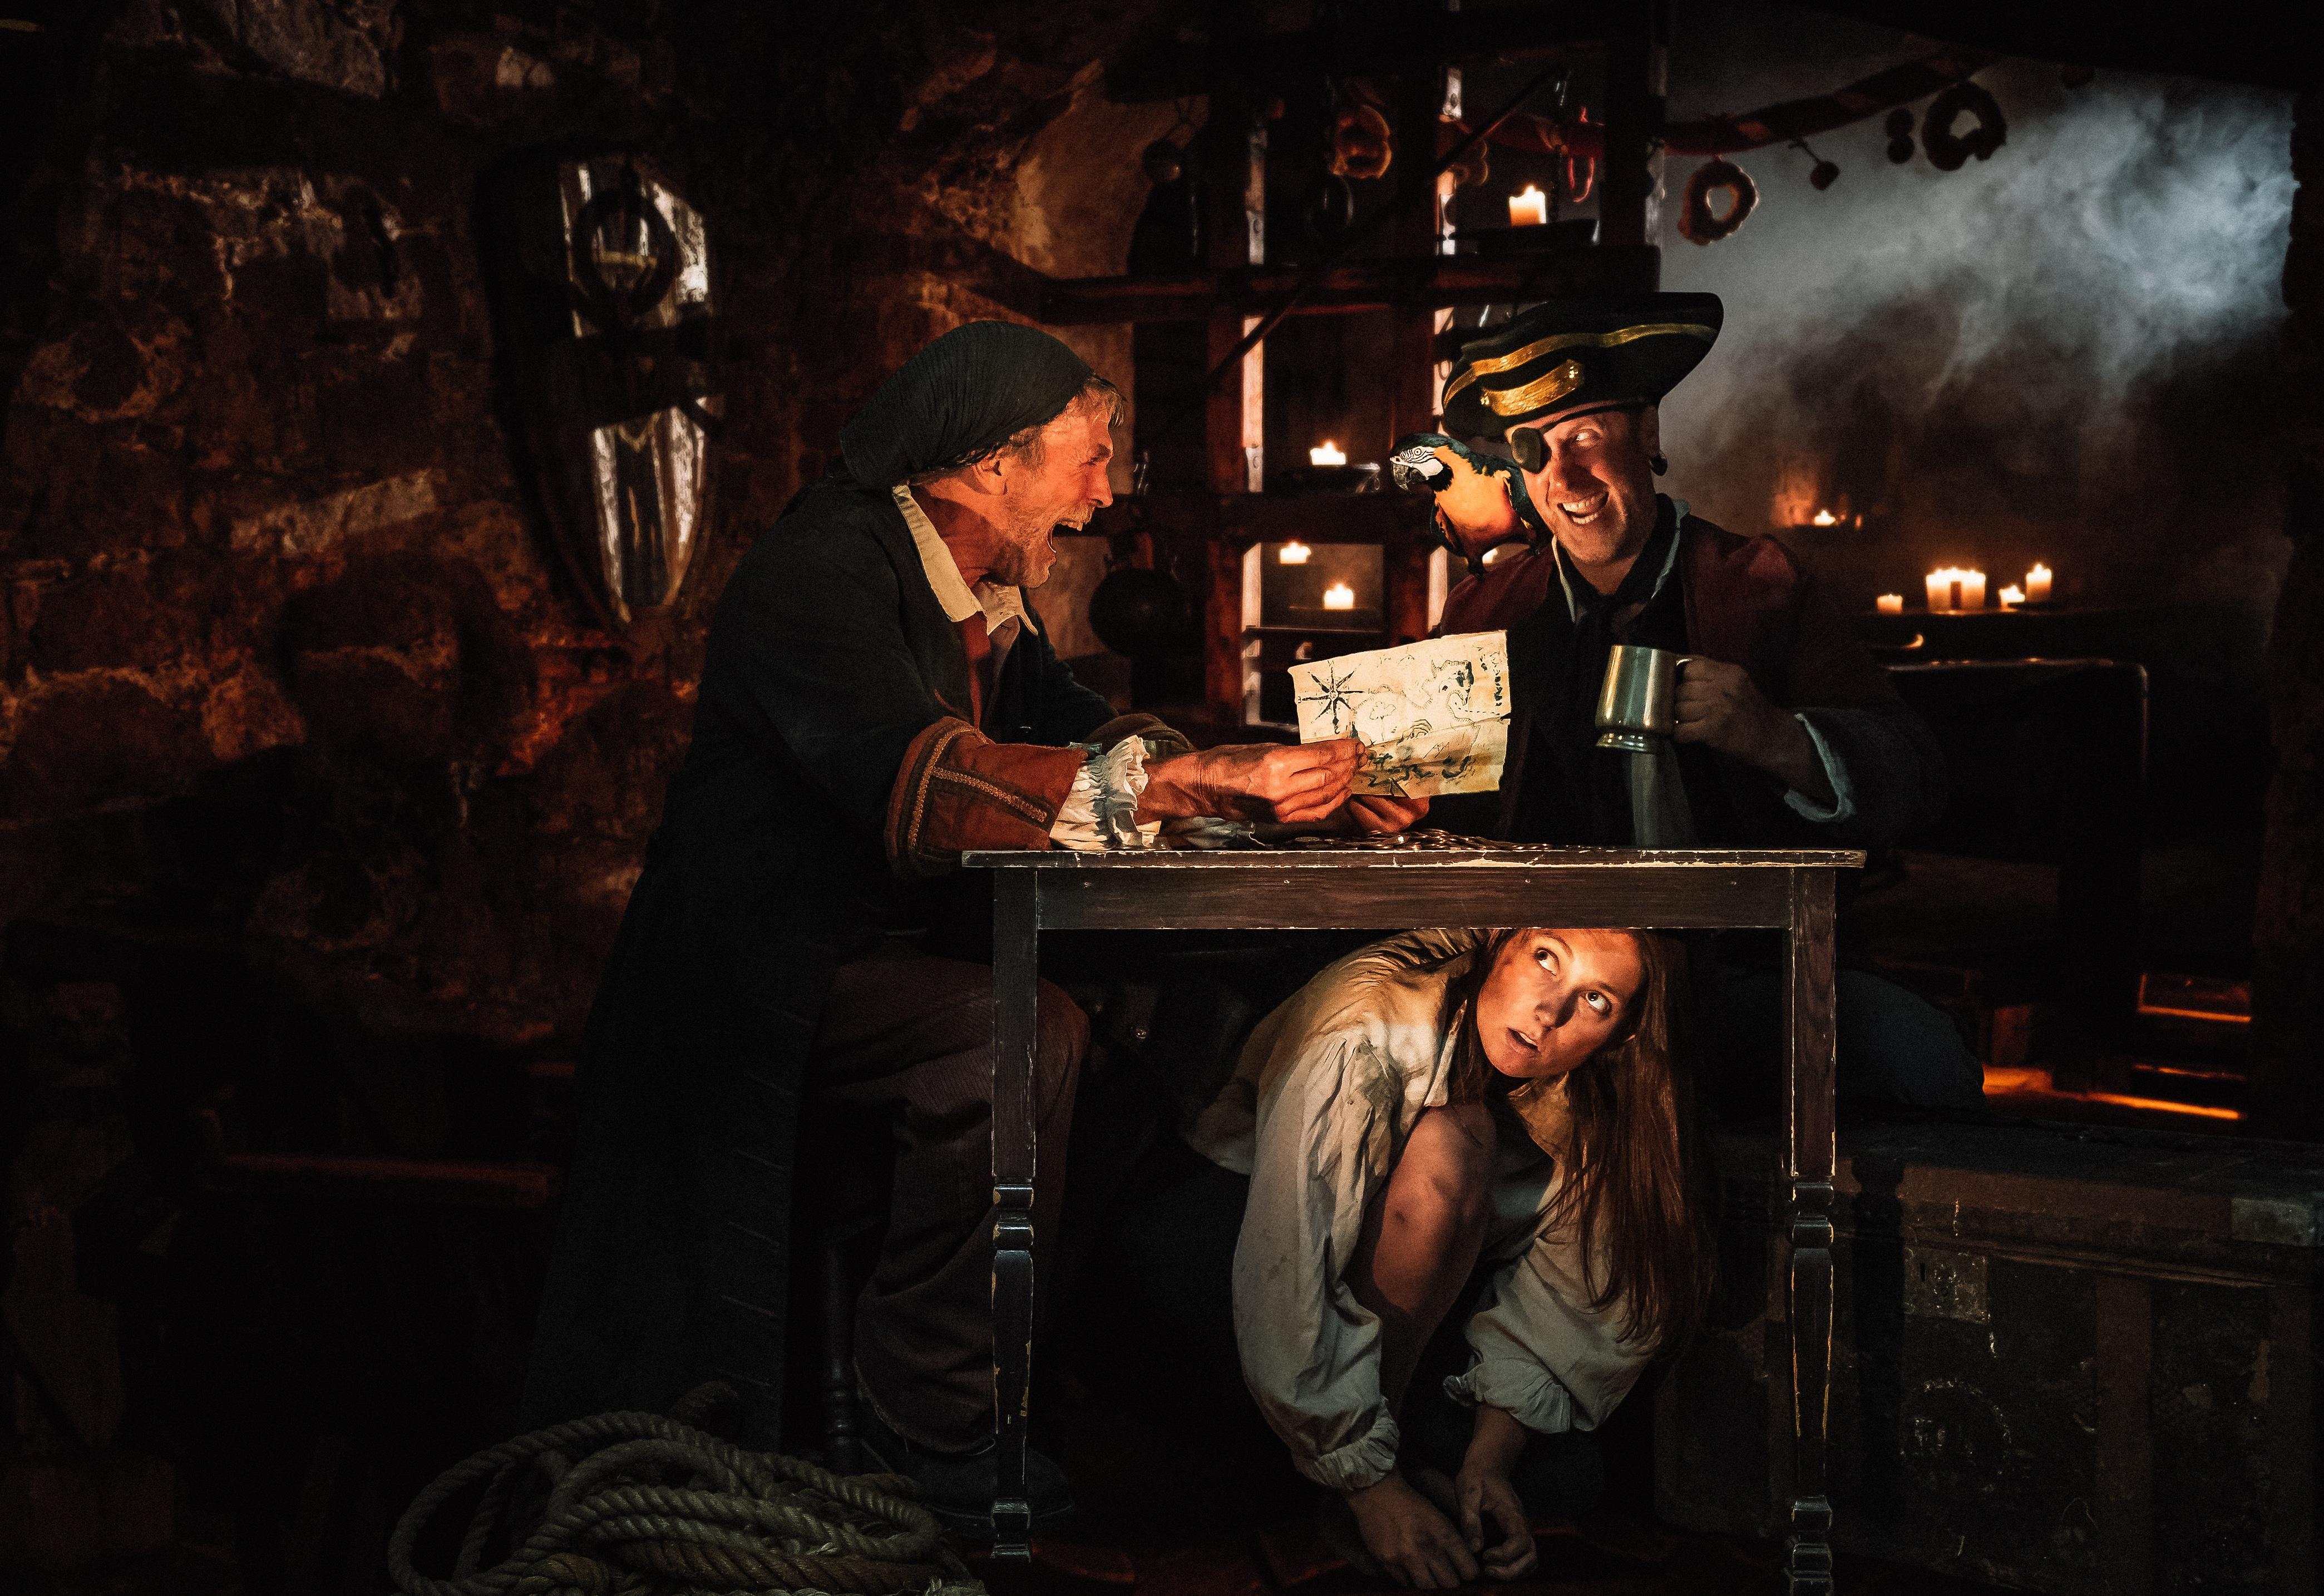 Treasure Island Photo by Kirstin Prisk